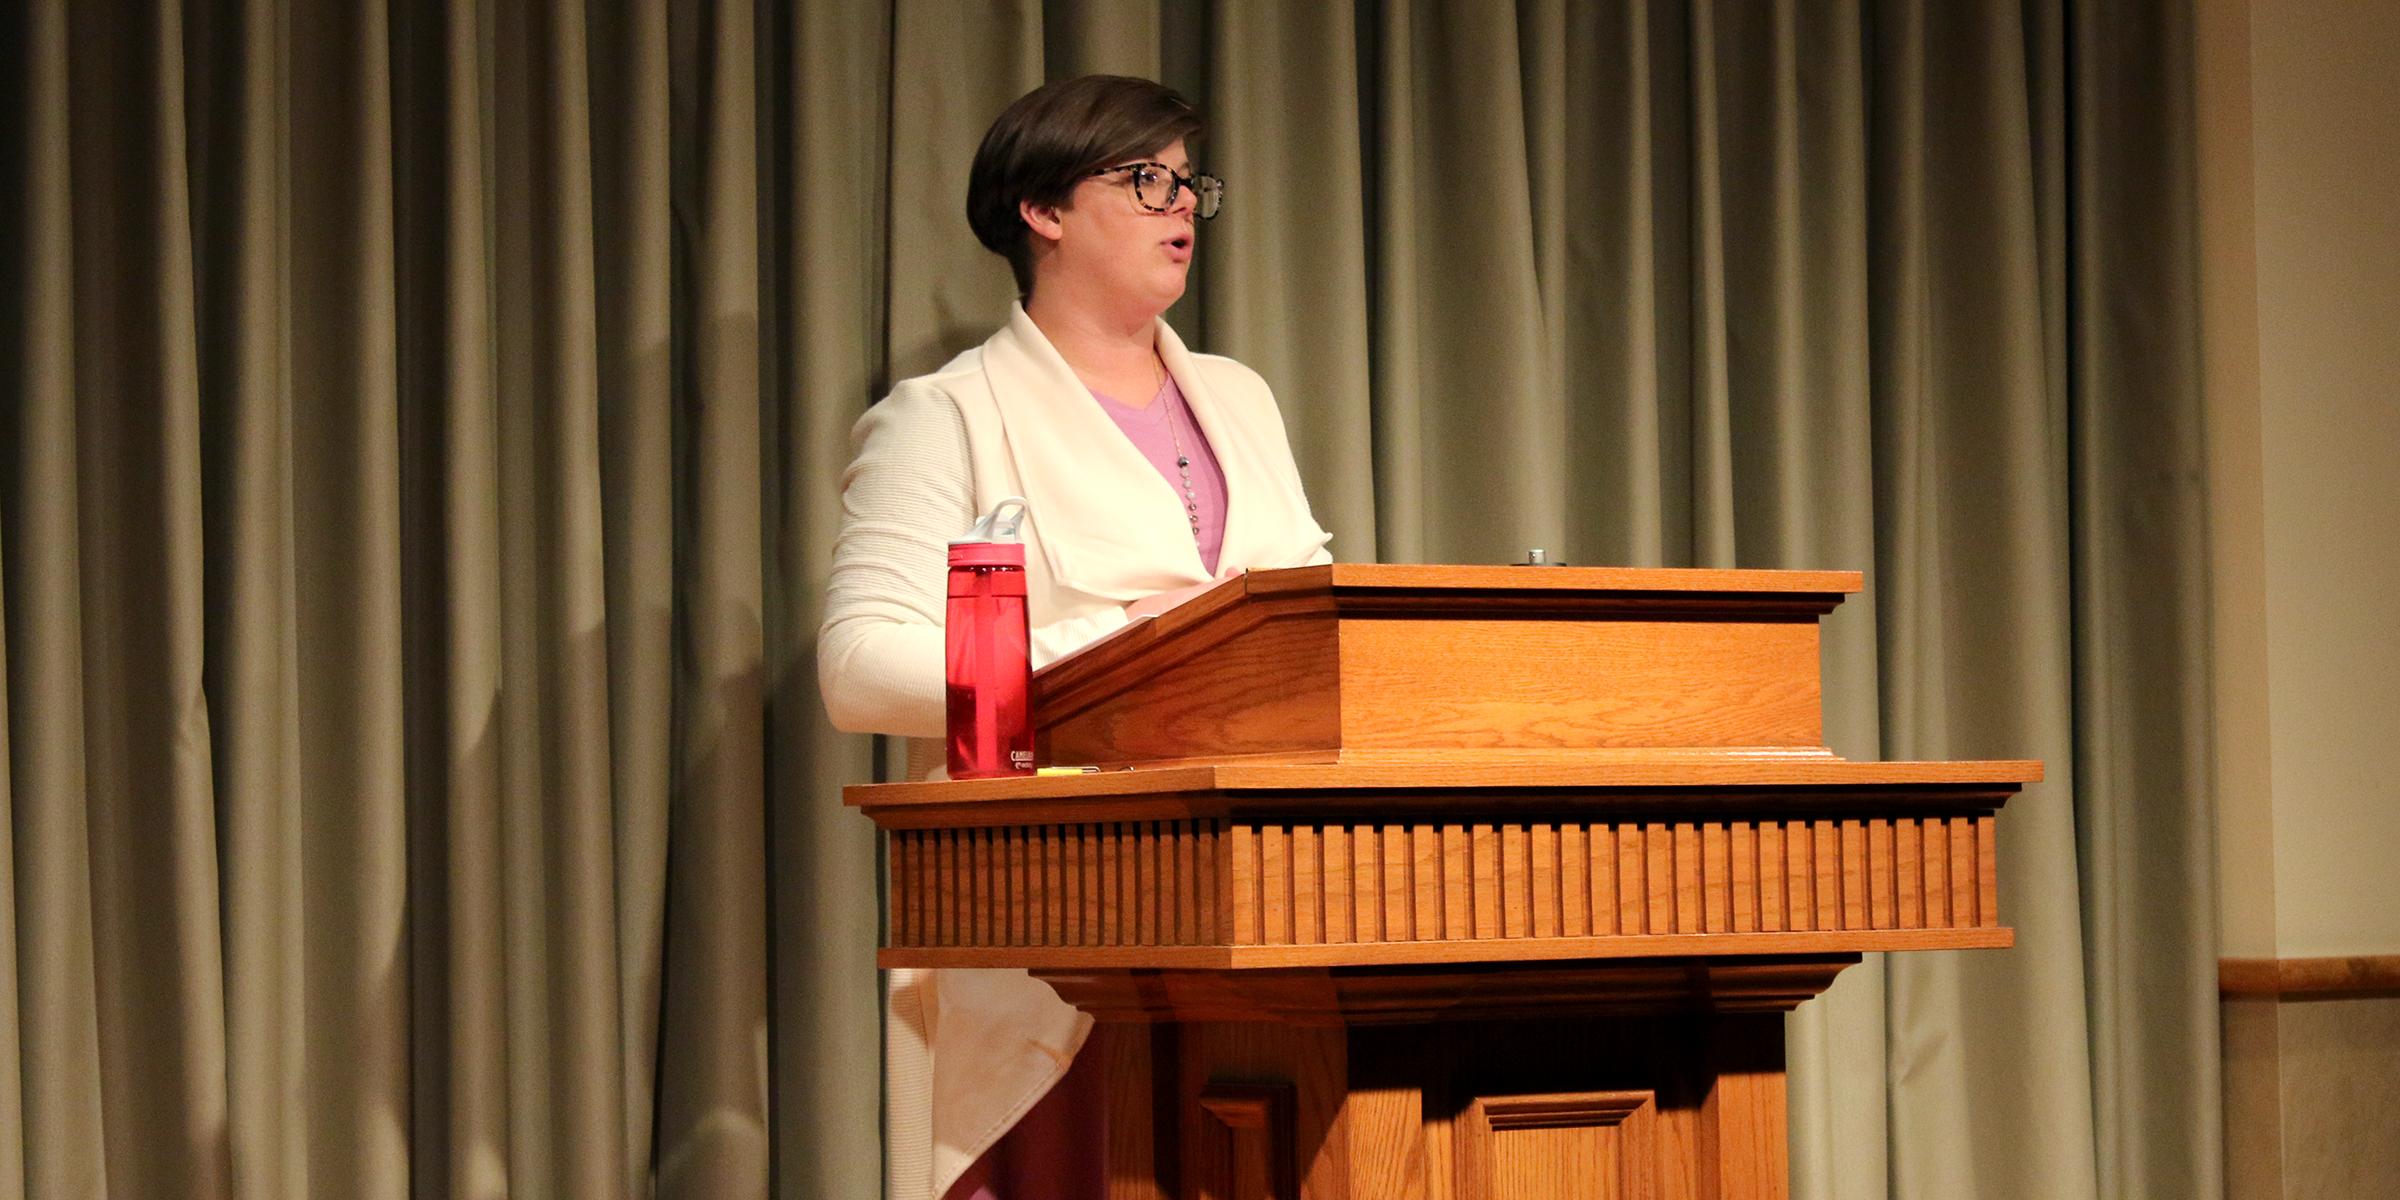 Michelle Shackelford Preaching